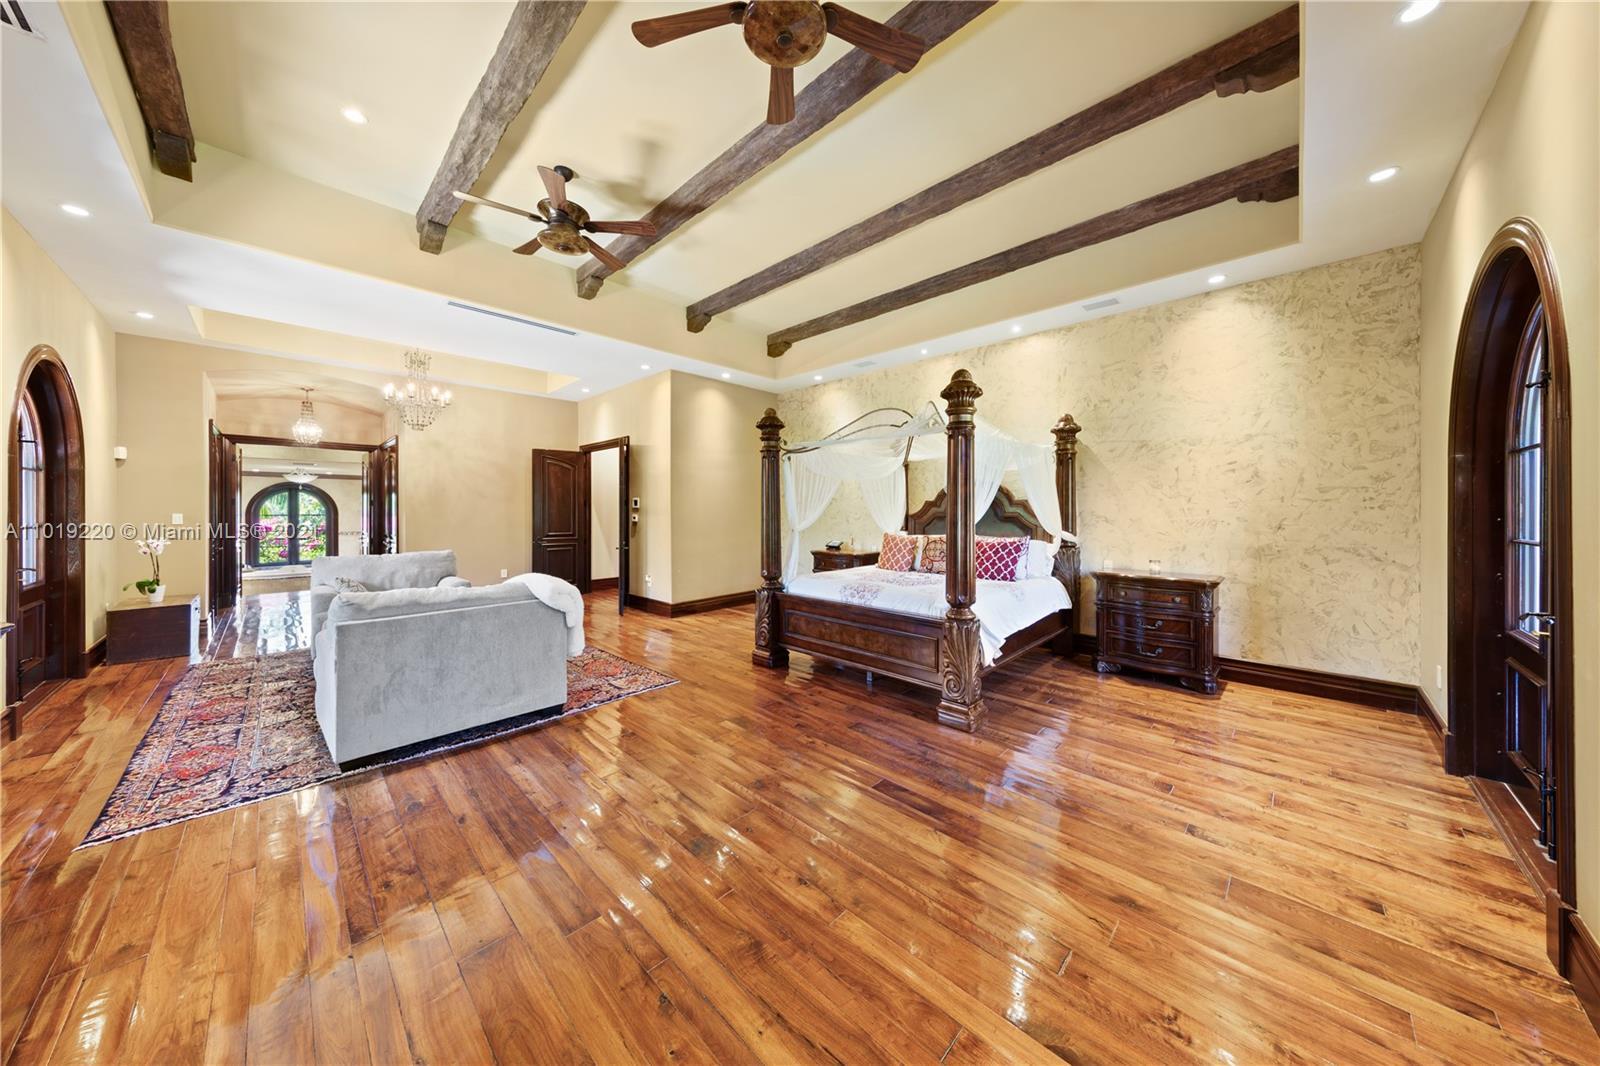 17201 Sw 248th St Property Photo 22